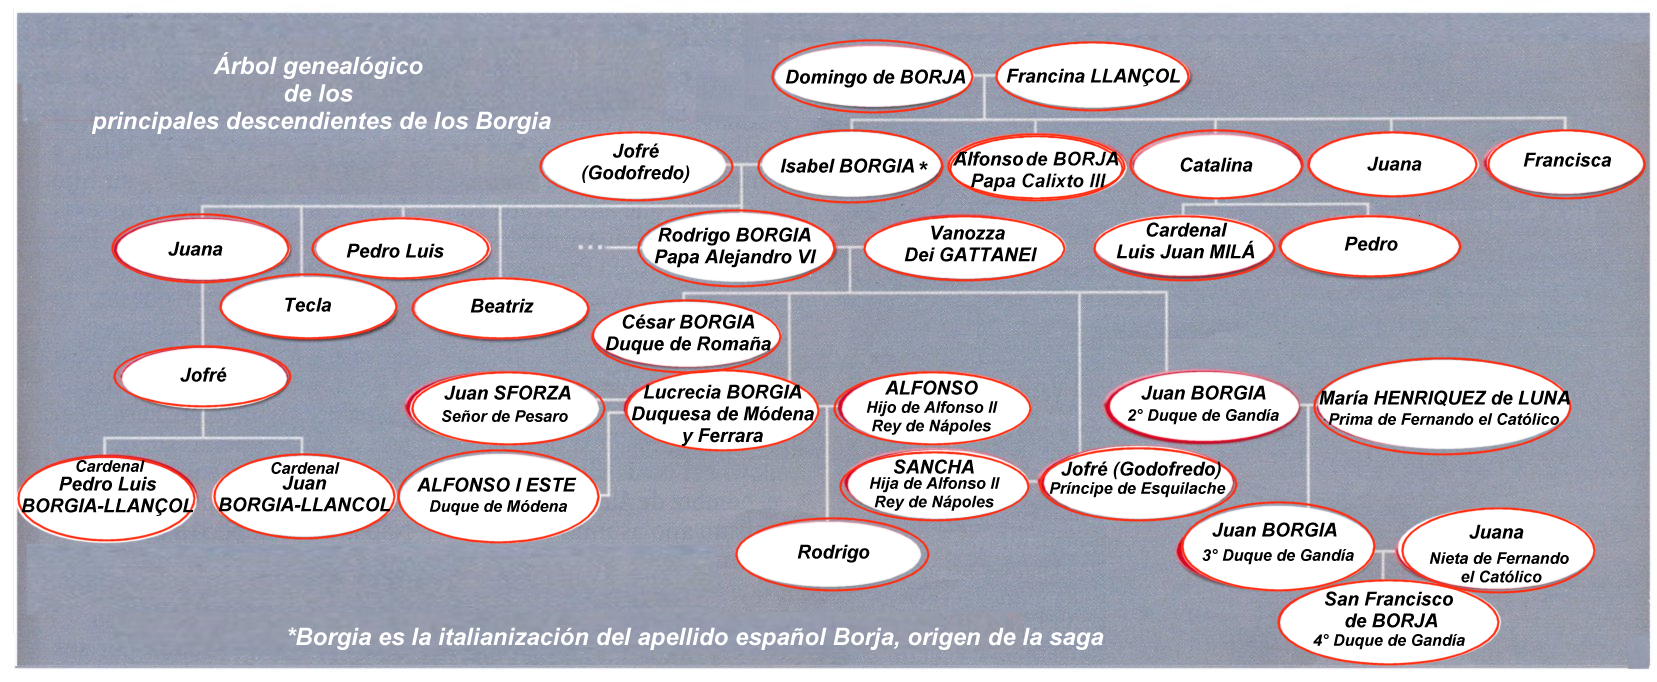 https://upload.wikimedia.org/wikipedia/commons/9/96/Borgia-genealog-es.png